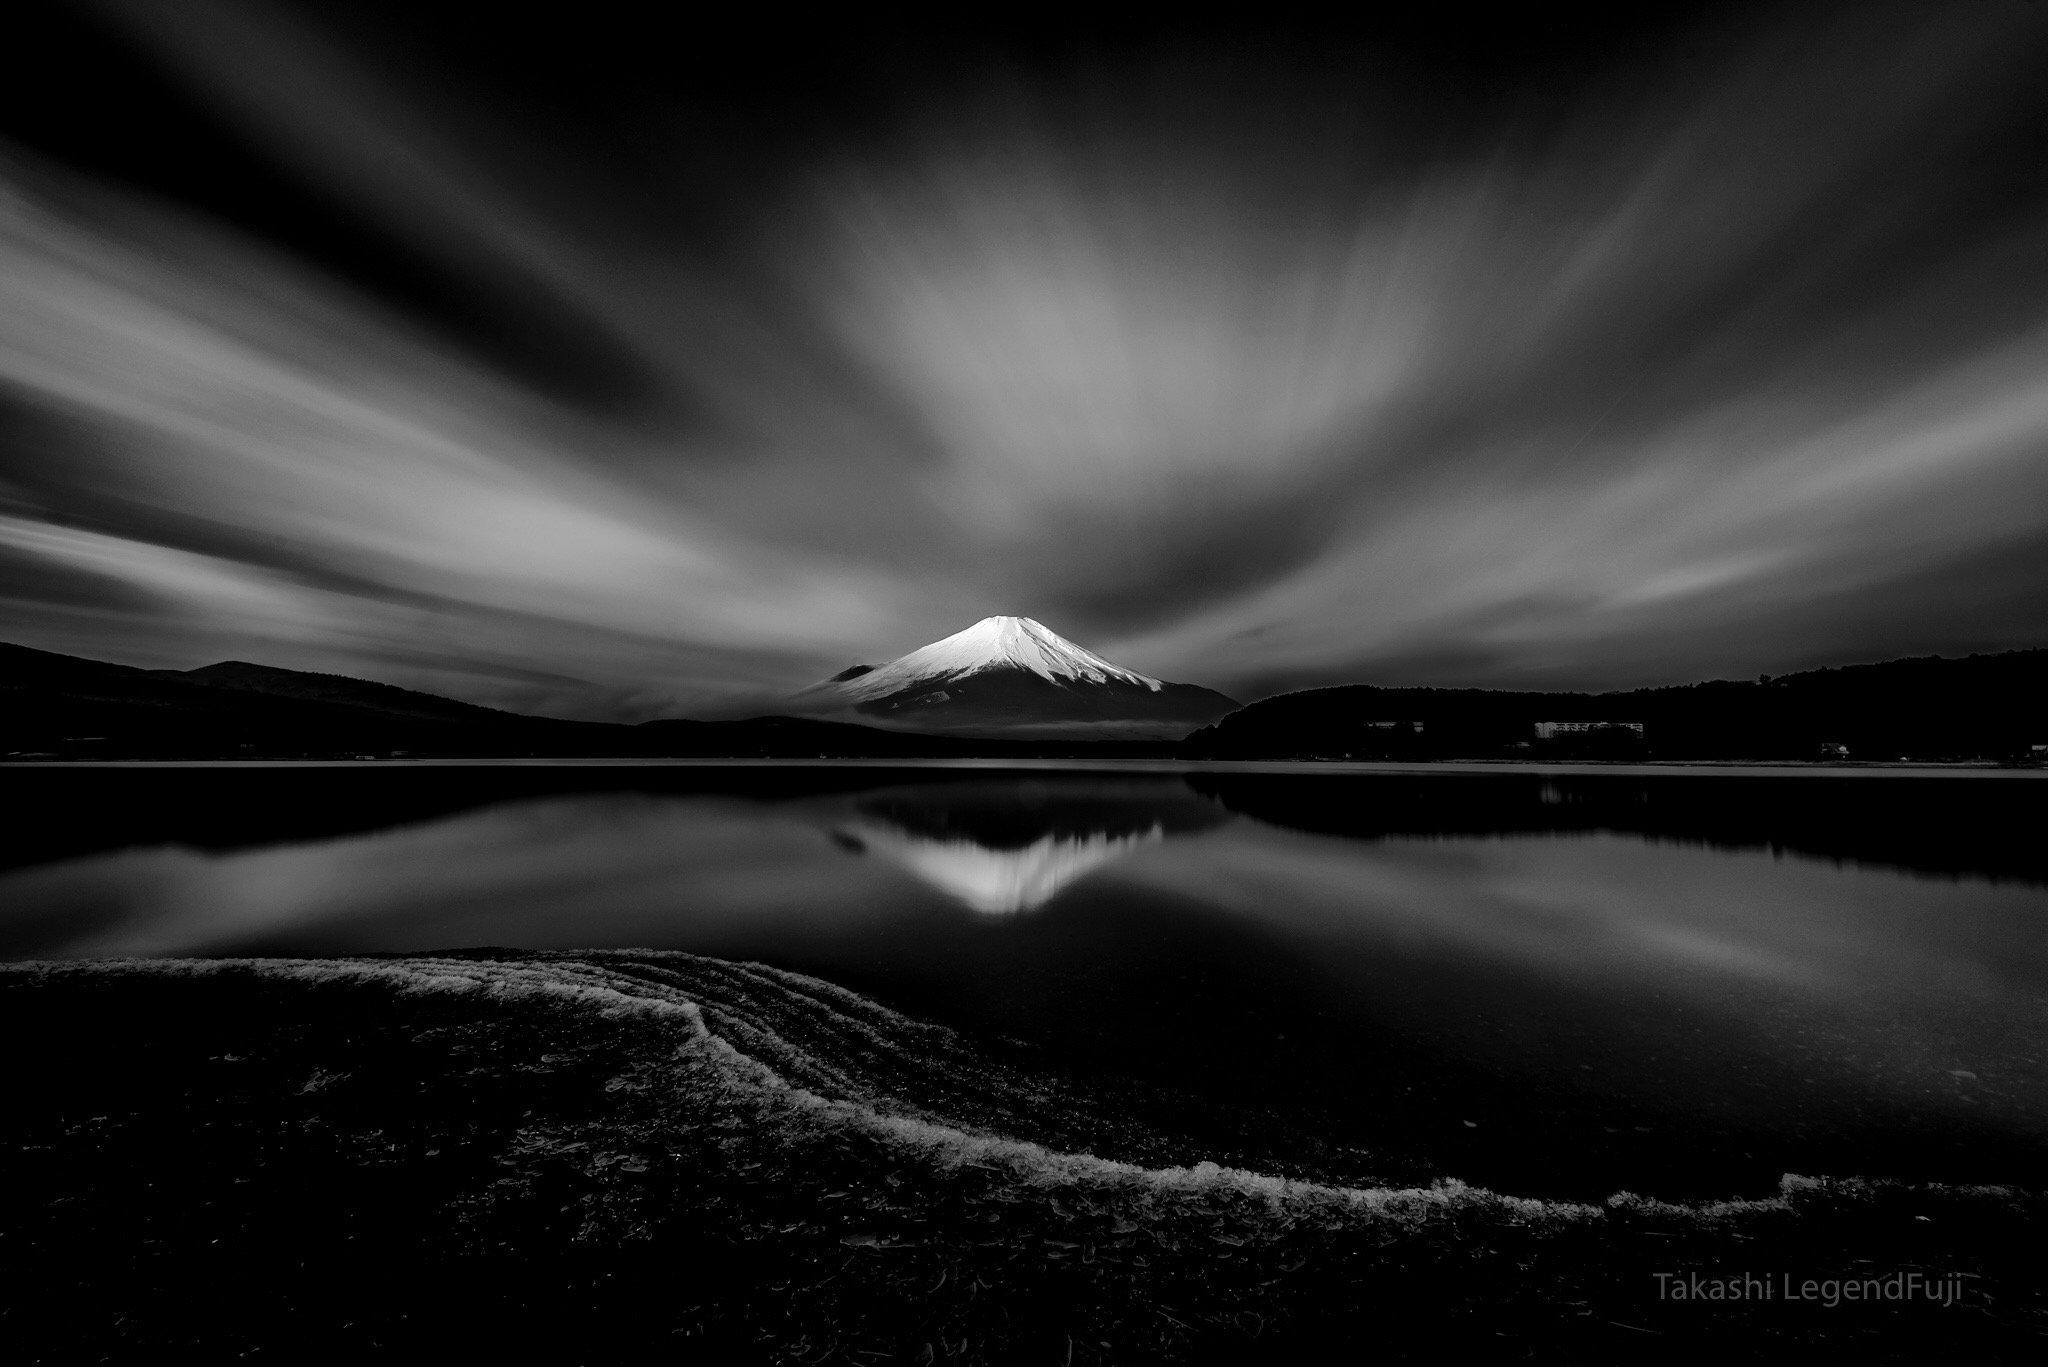 Fuji,Japan,mountain,lake water,ice,cloud,reflection,sky, Takashi